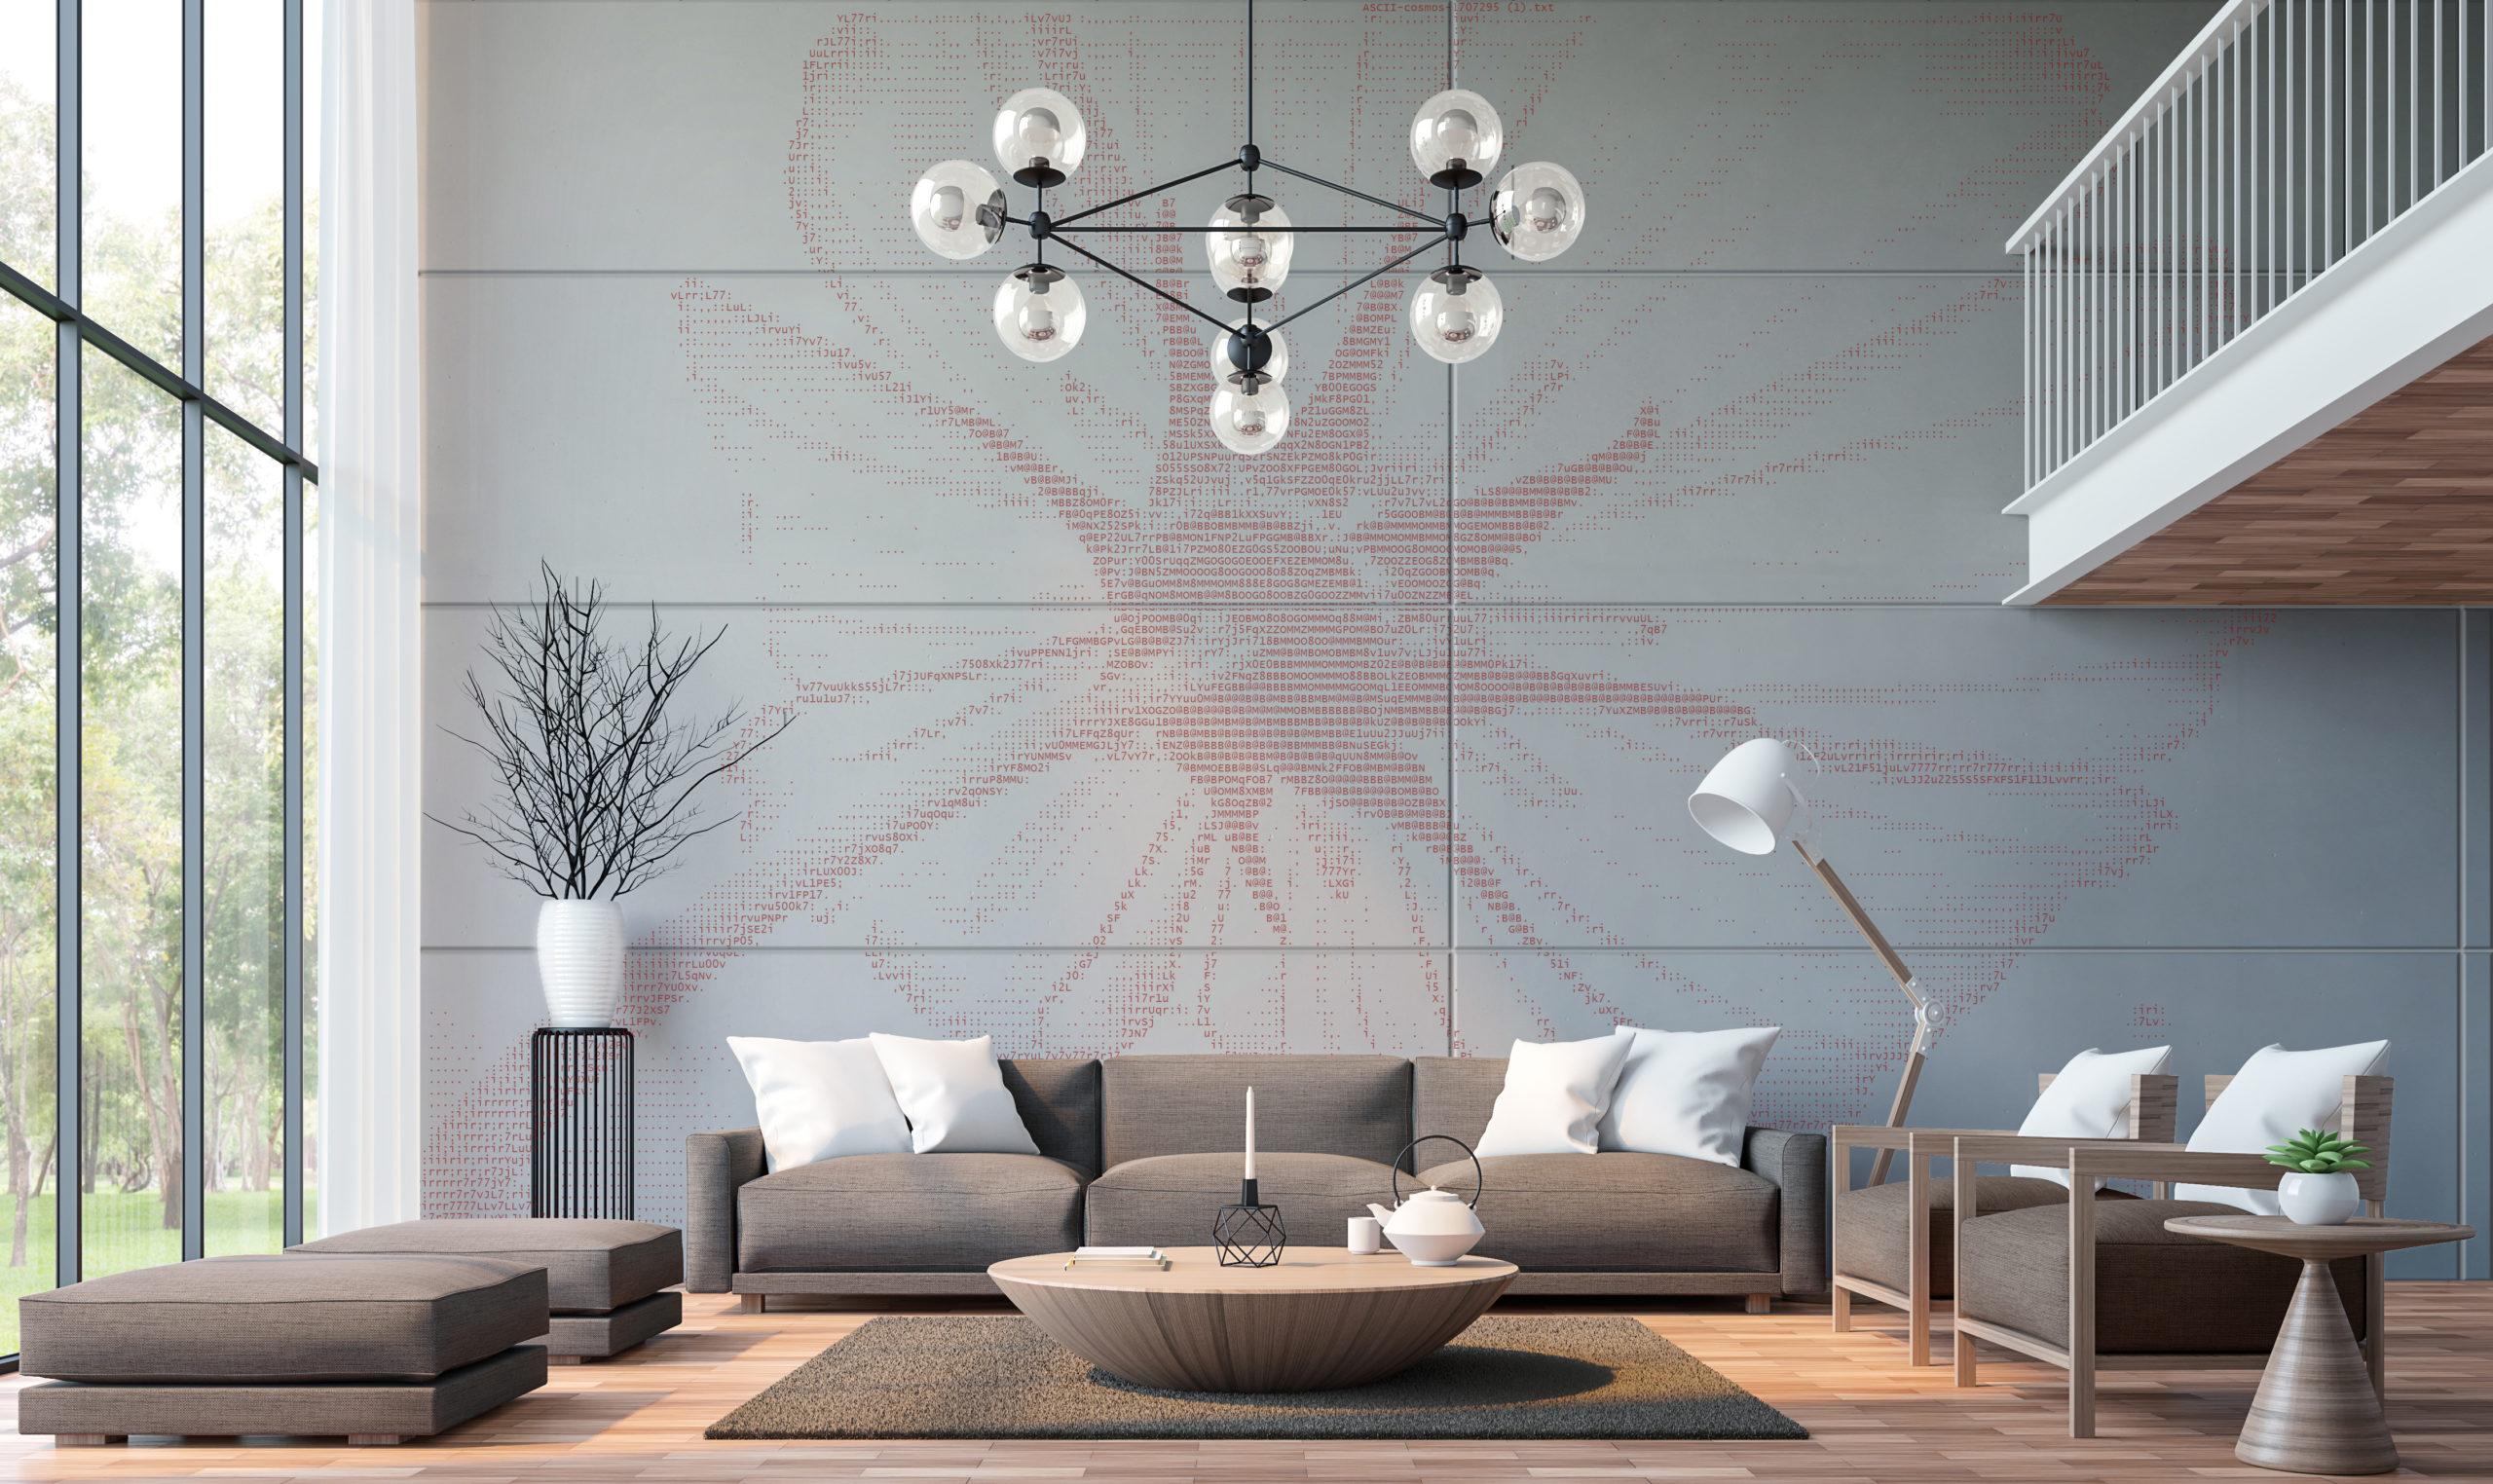 Modern living room with mezzanine 3d rendering image